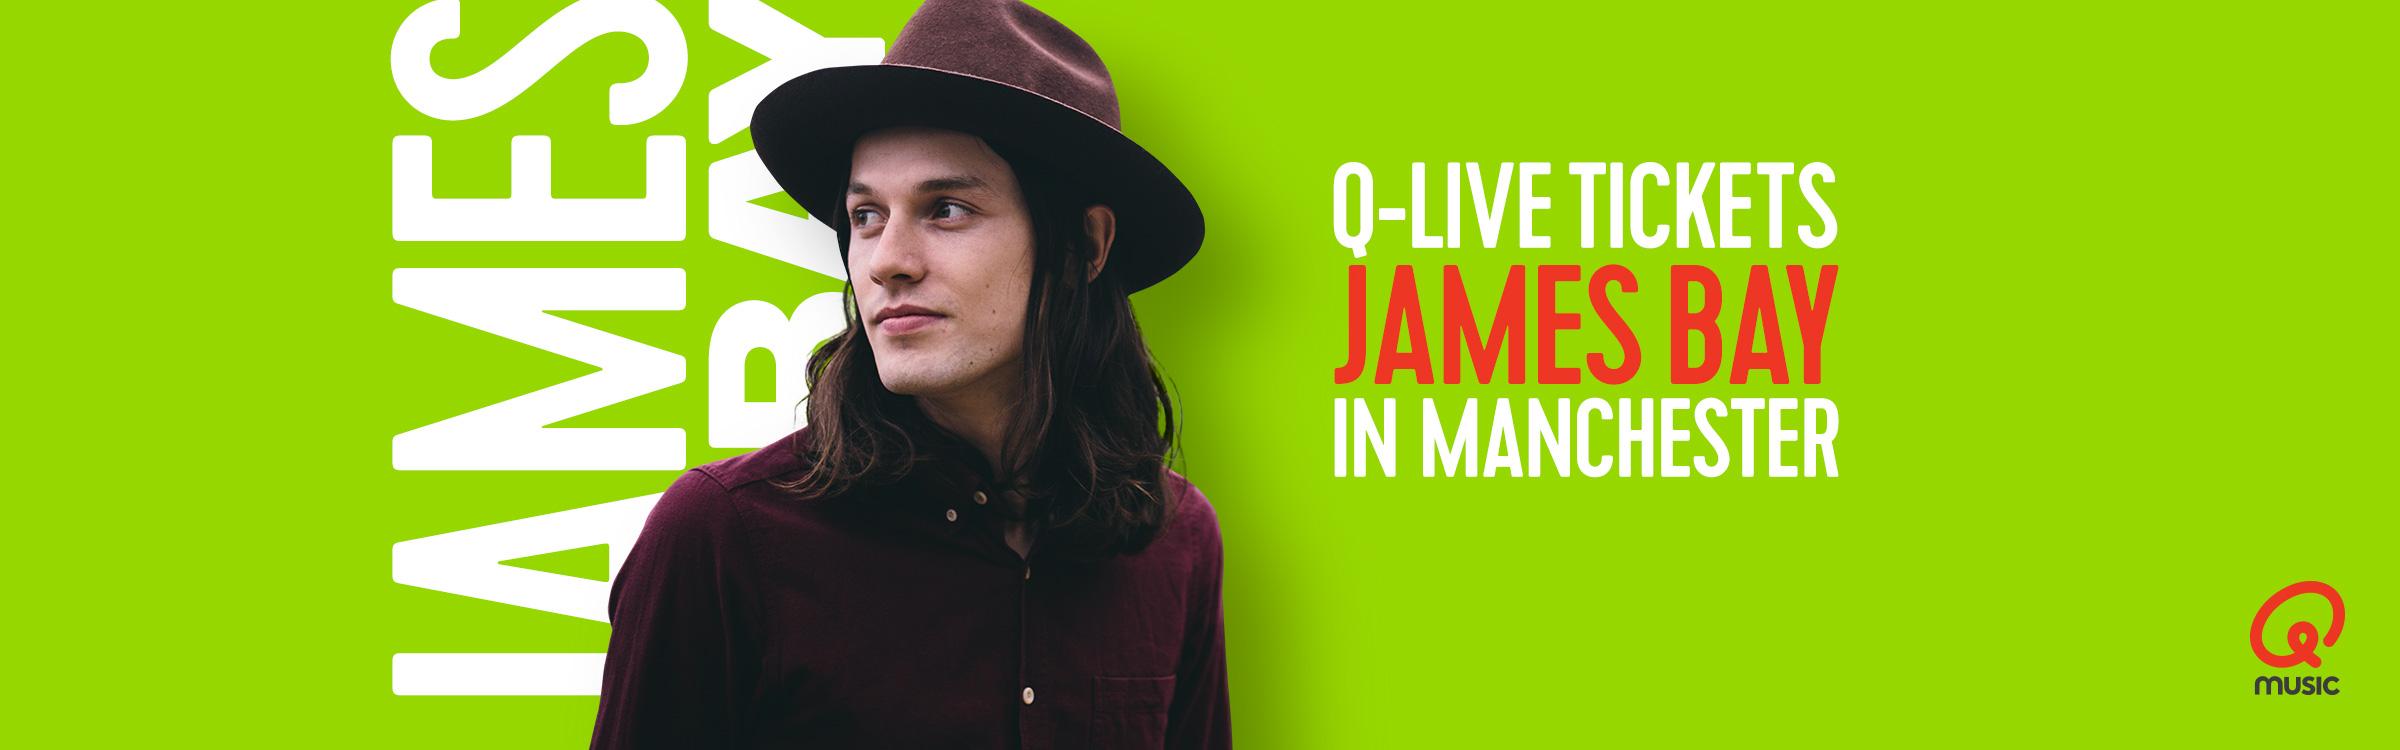 Qmusic actionheader jamesbay